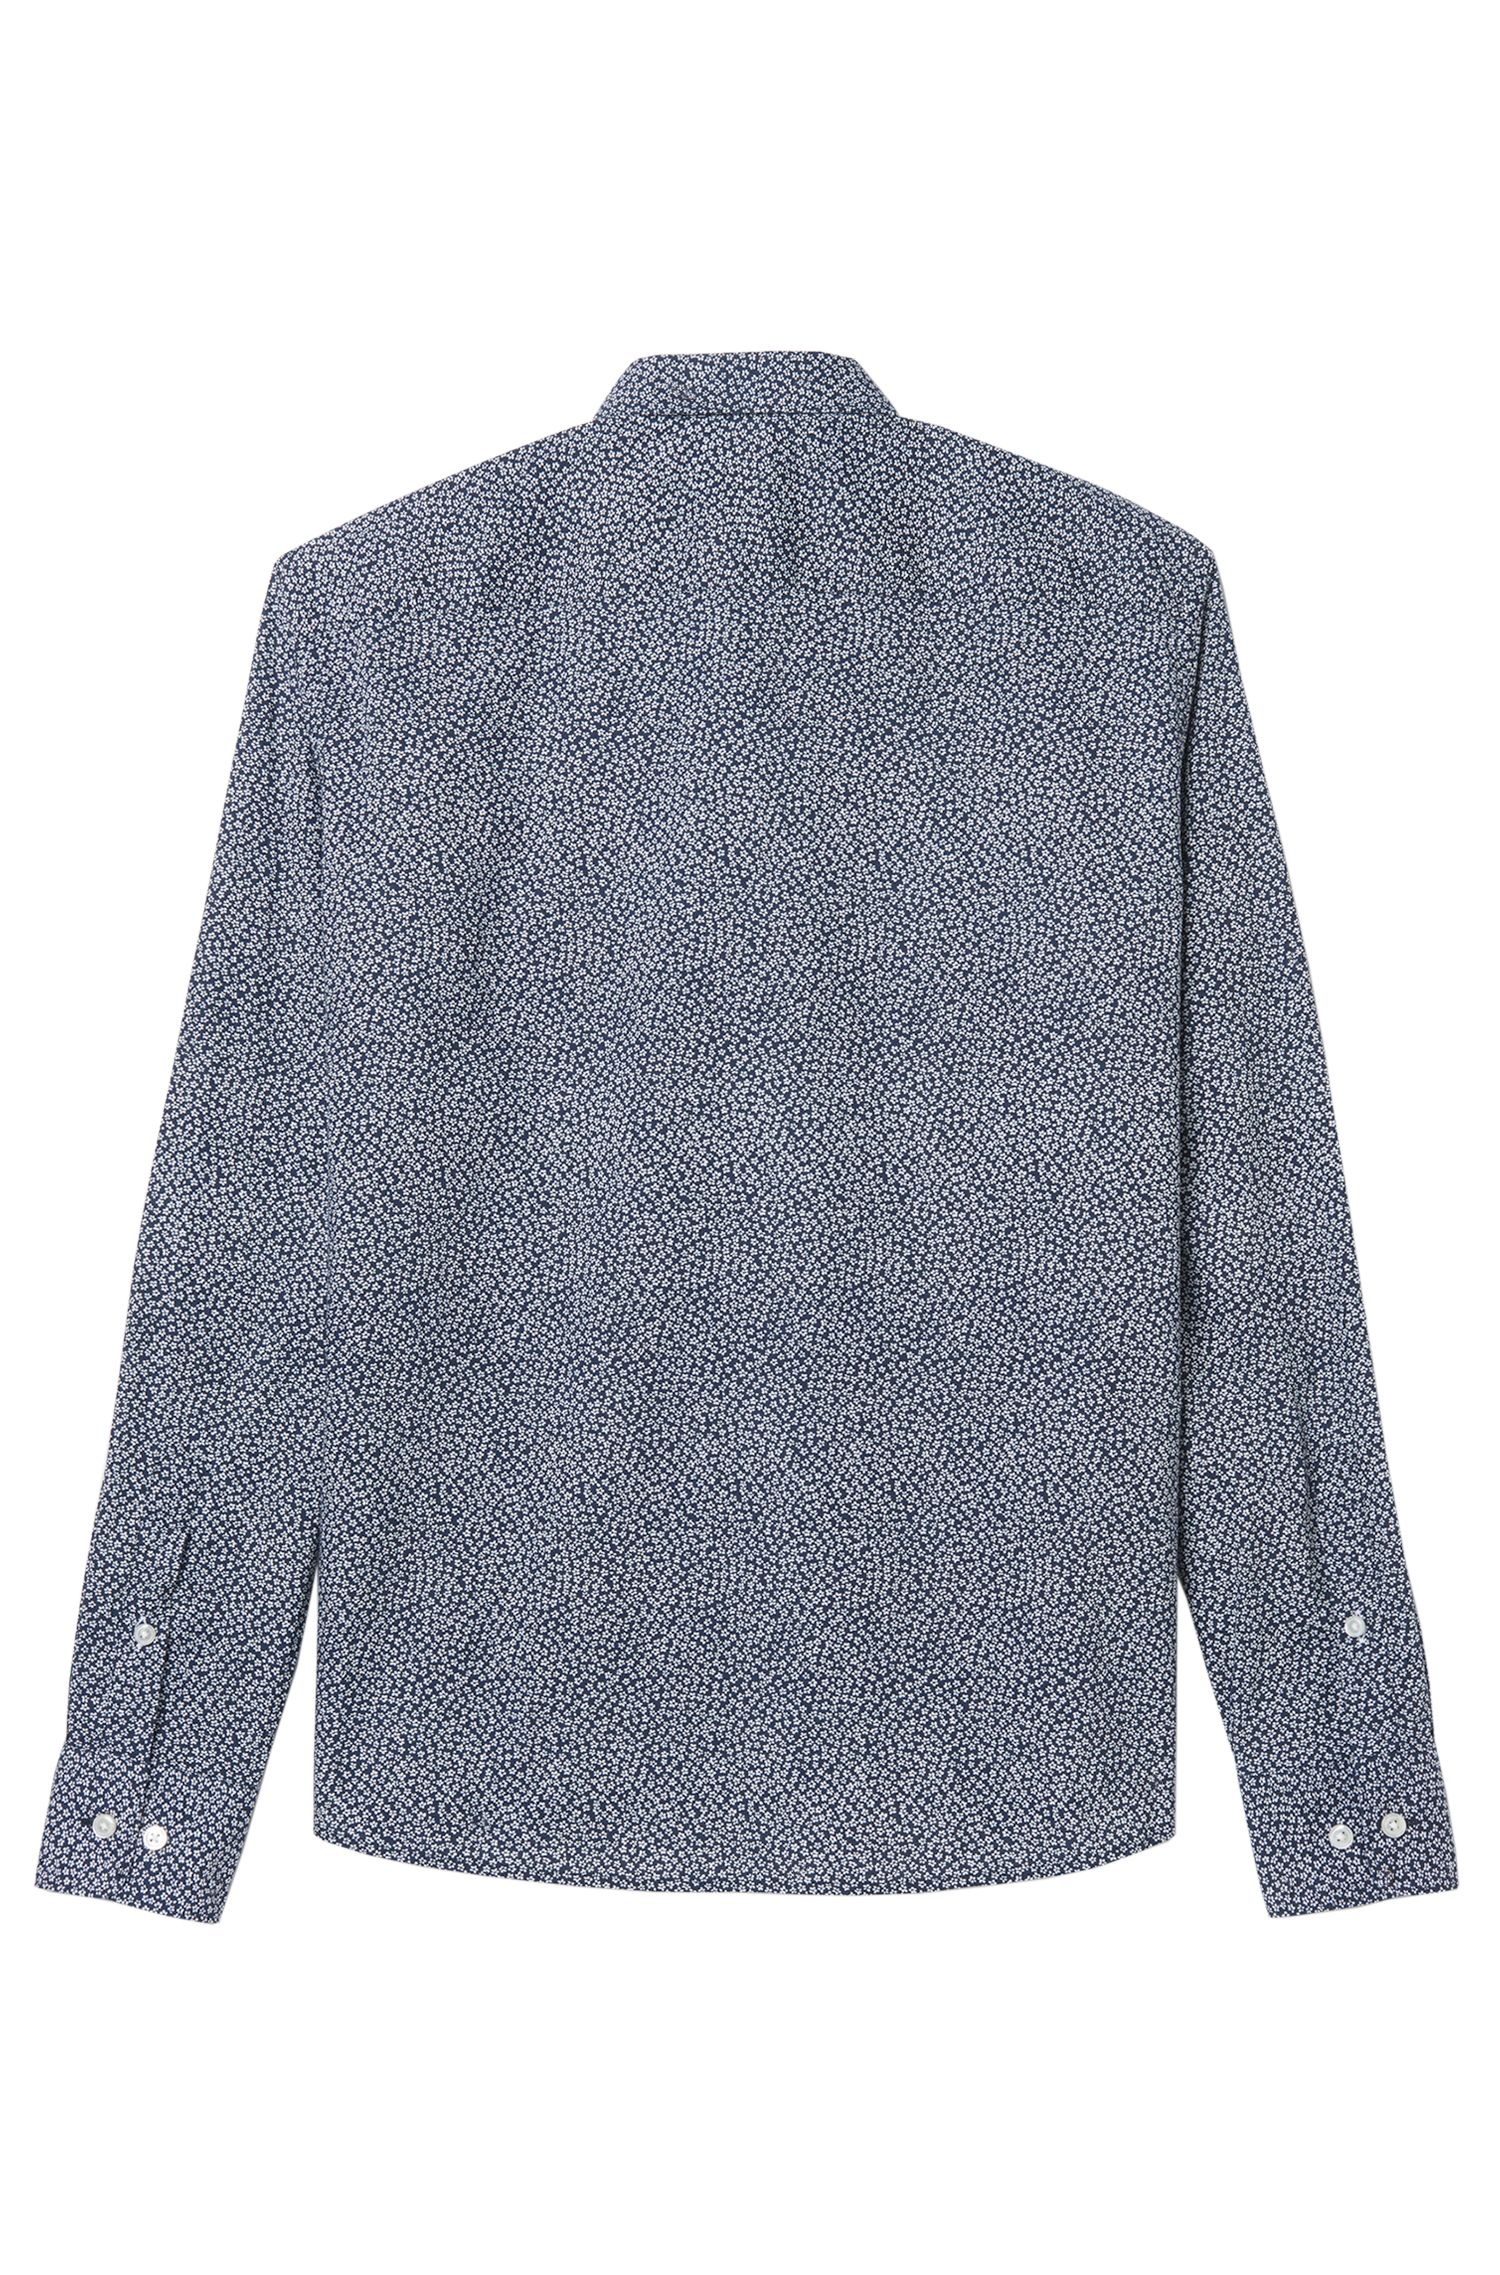 Cotton Flower Print Sport Shirt, Slim Fit | Reid